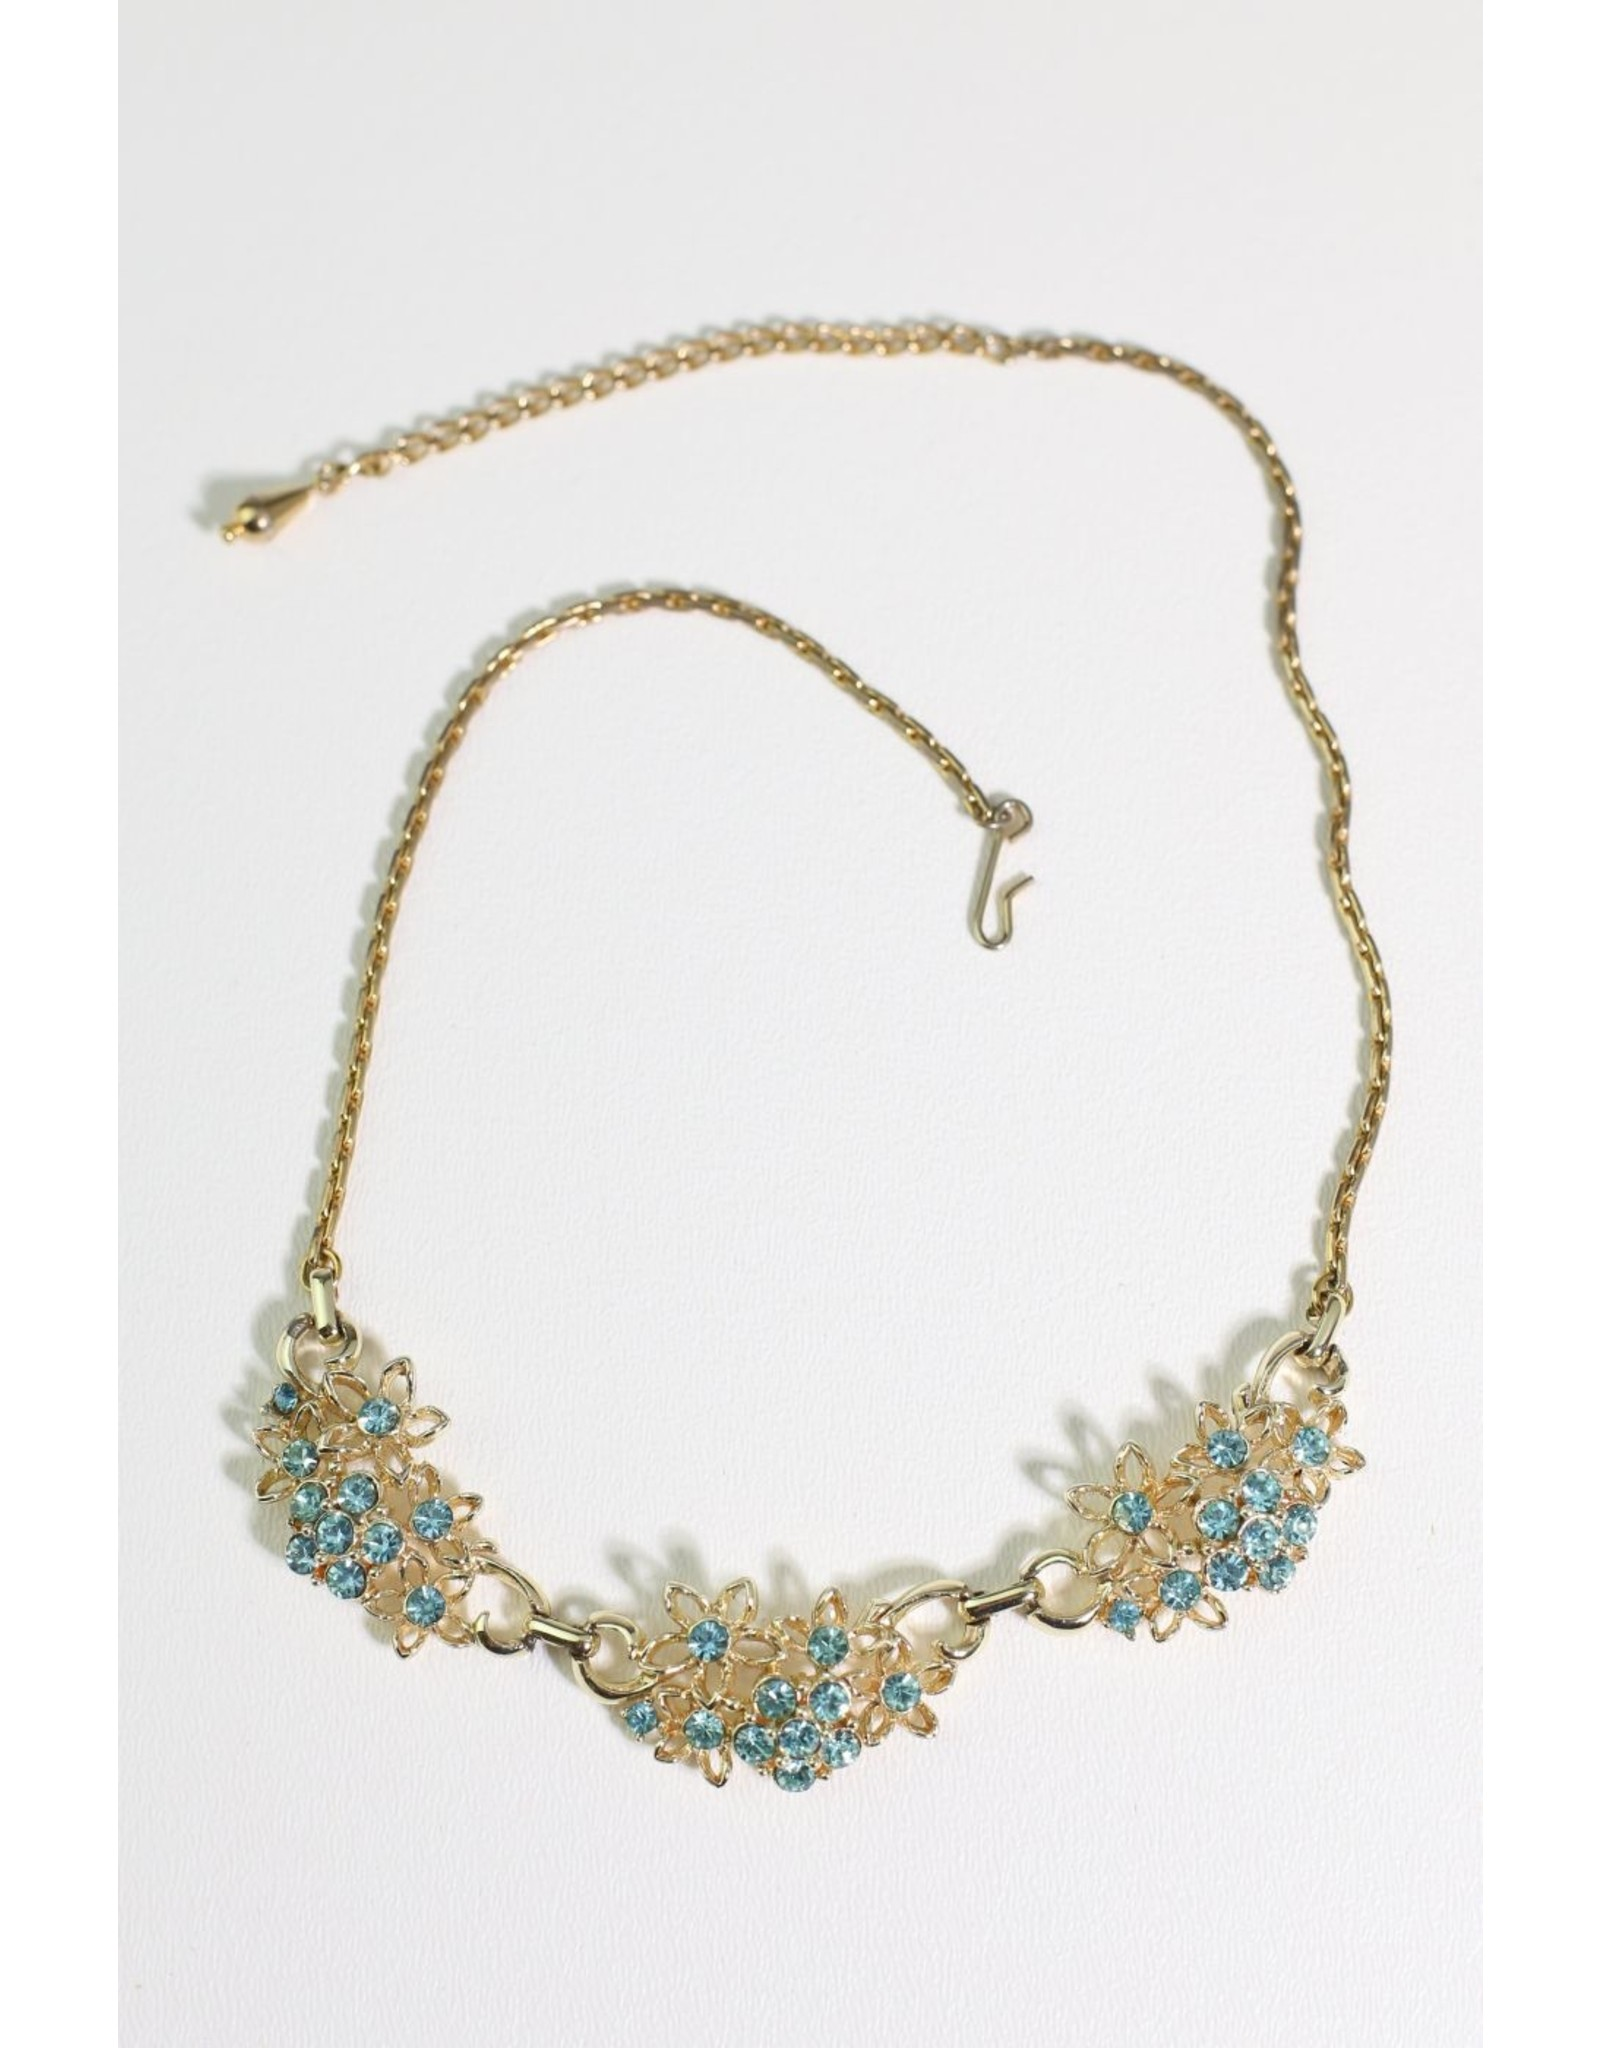 1960's Gold w/ Blue Rhinestones Necklace